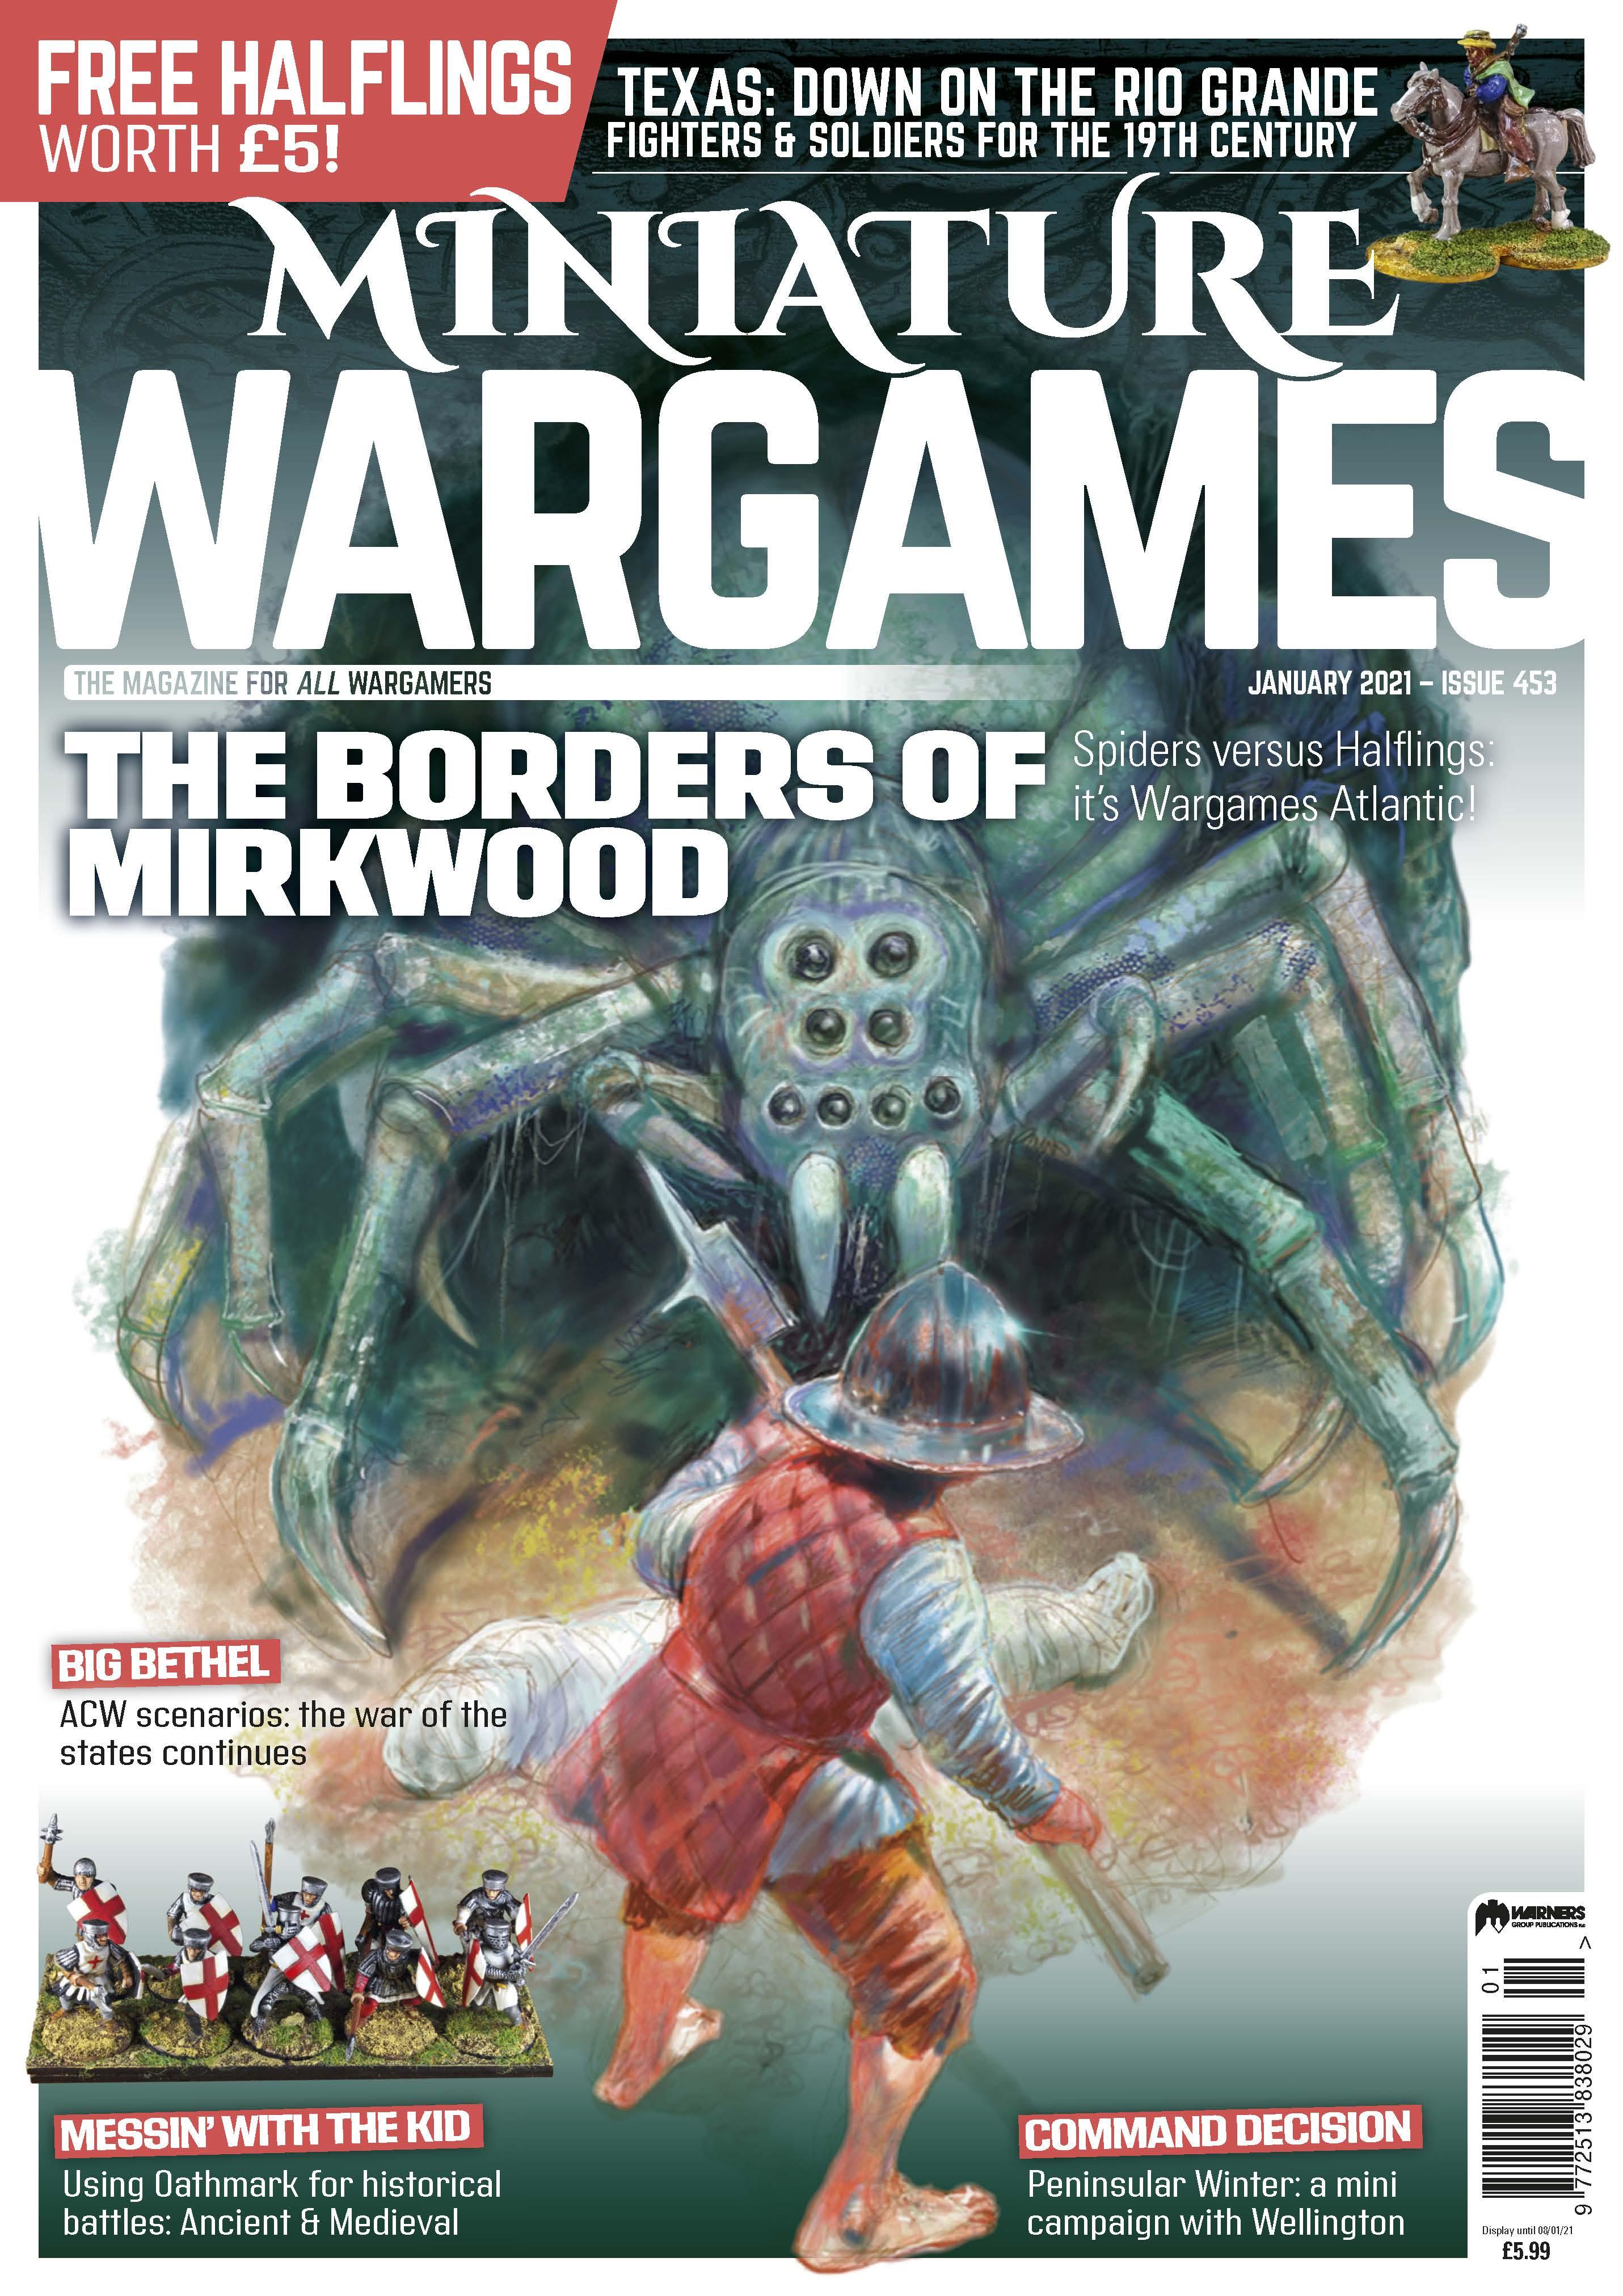 Miniature Wargames 453 -  Tabletop Gaming